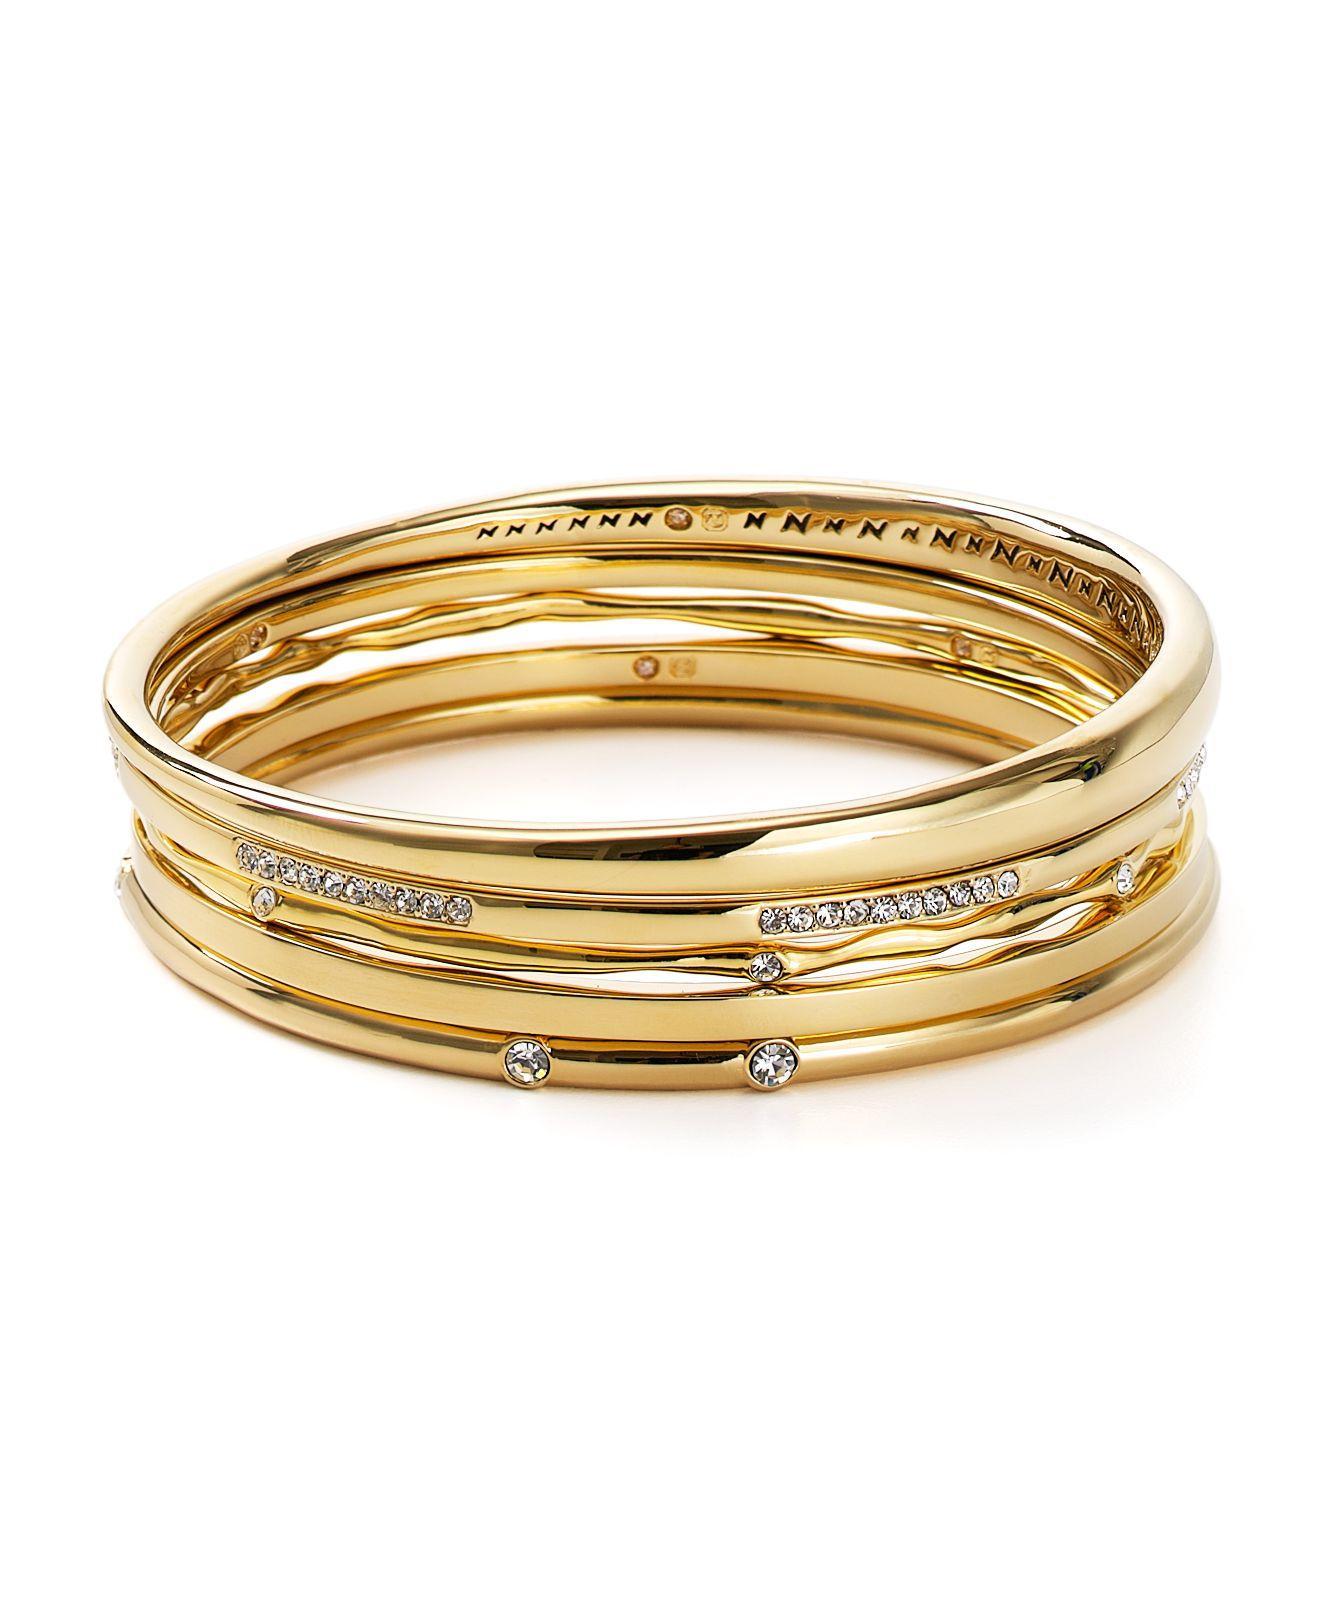 Nadri Round Bangle in Metallic